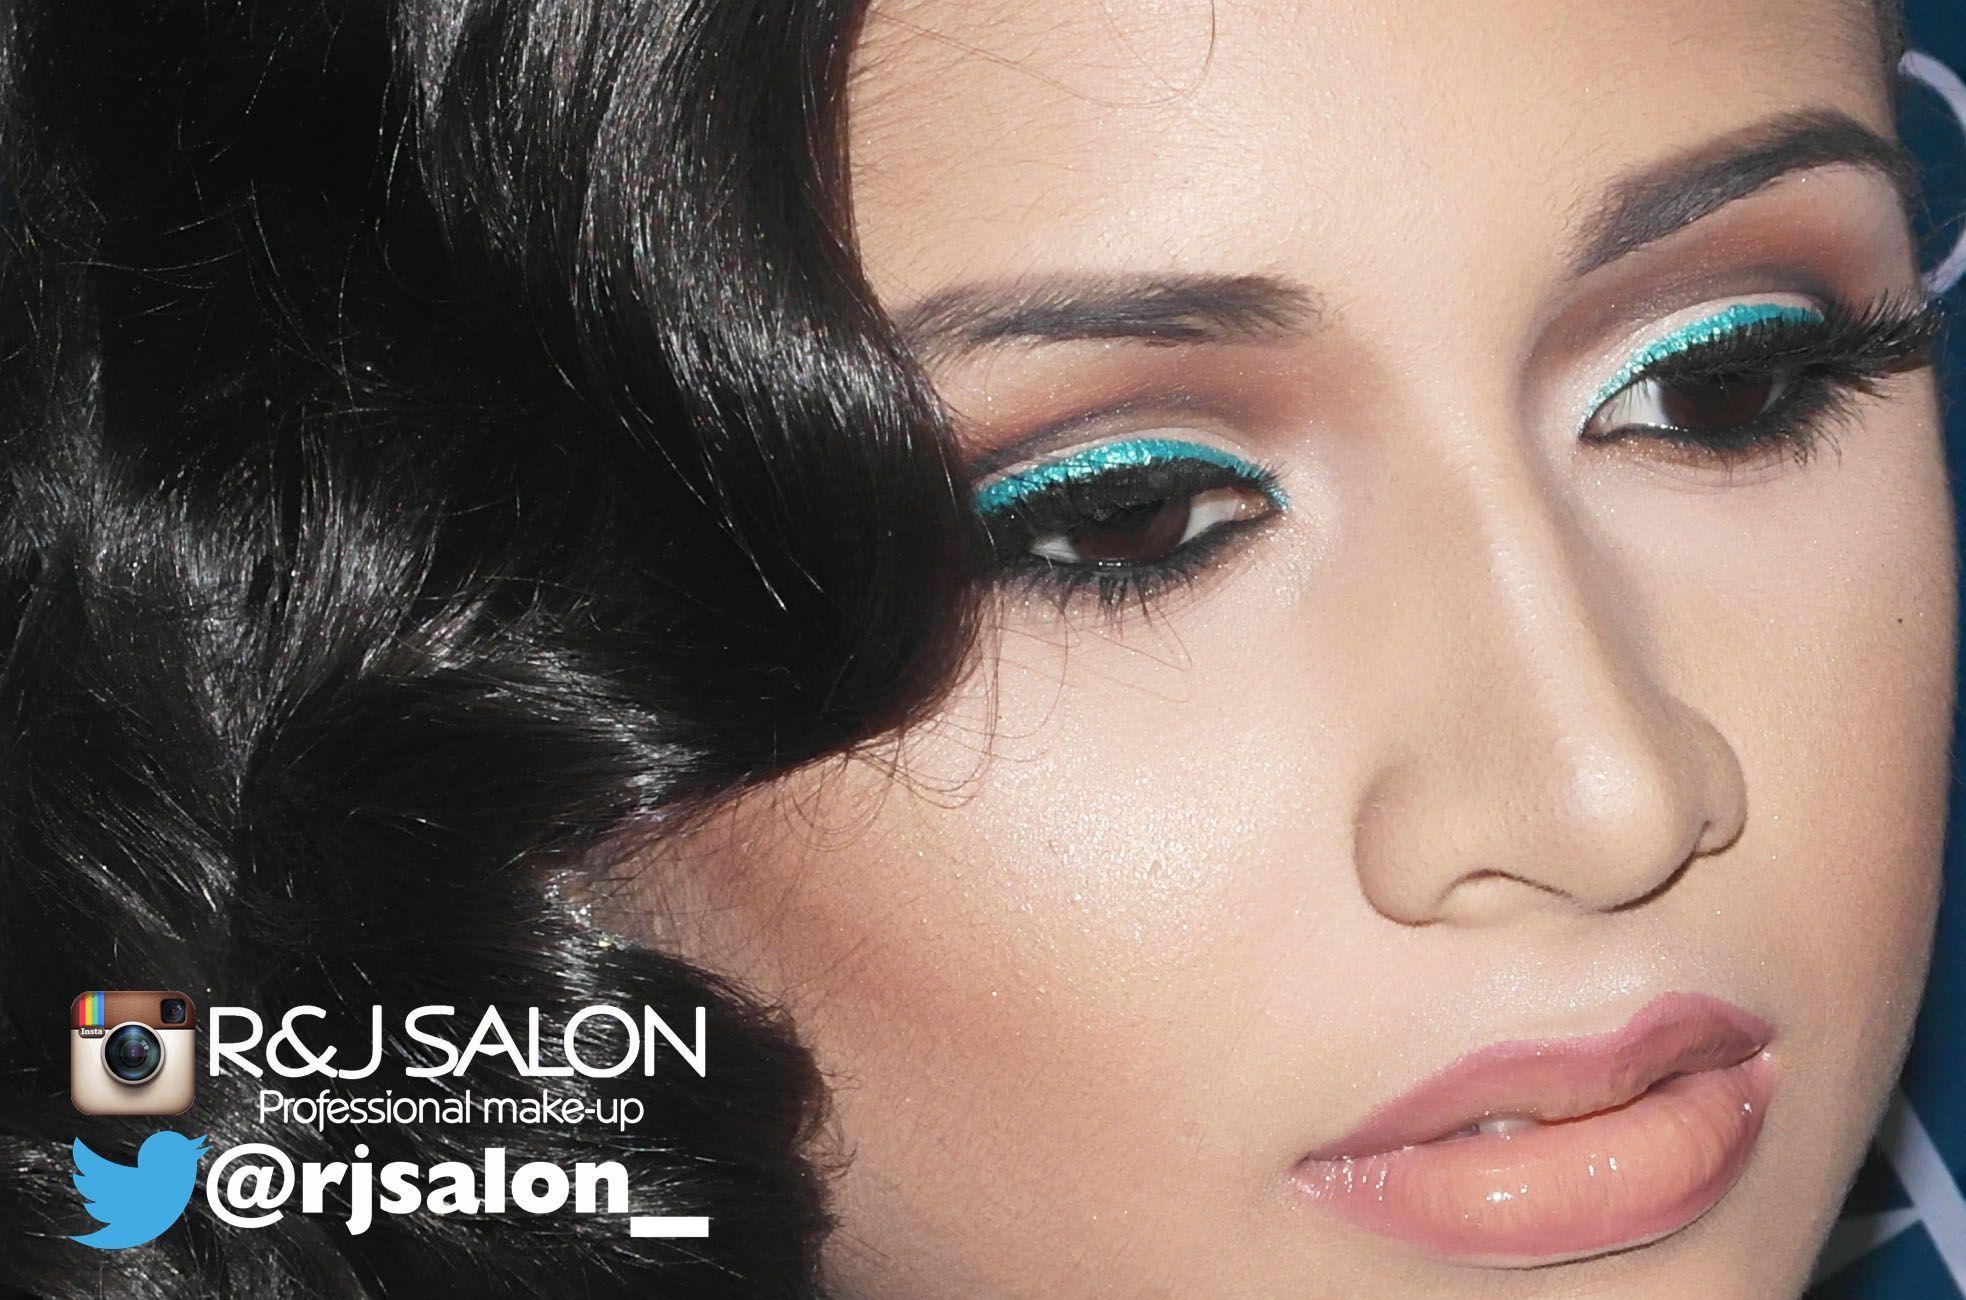 Arianys Alejandra Mercado Herrera  Miss Teen Panamá Américas 2015 Todo está listo para la Gala Nacional de la Belleza 2015 Miss Earth Panamá  Makeup and Hair by R&J SALON @rjsalon_ PREVIA CITA 394 8158 / 59  BETHANIA. CAMINO REAL @rodolfoalexander @jkharyn #makeup  #makeupartis #tecnicas #artistas #contouringandhighlighting #panamá #rjsalon..